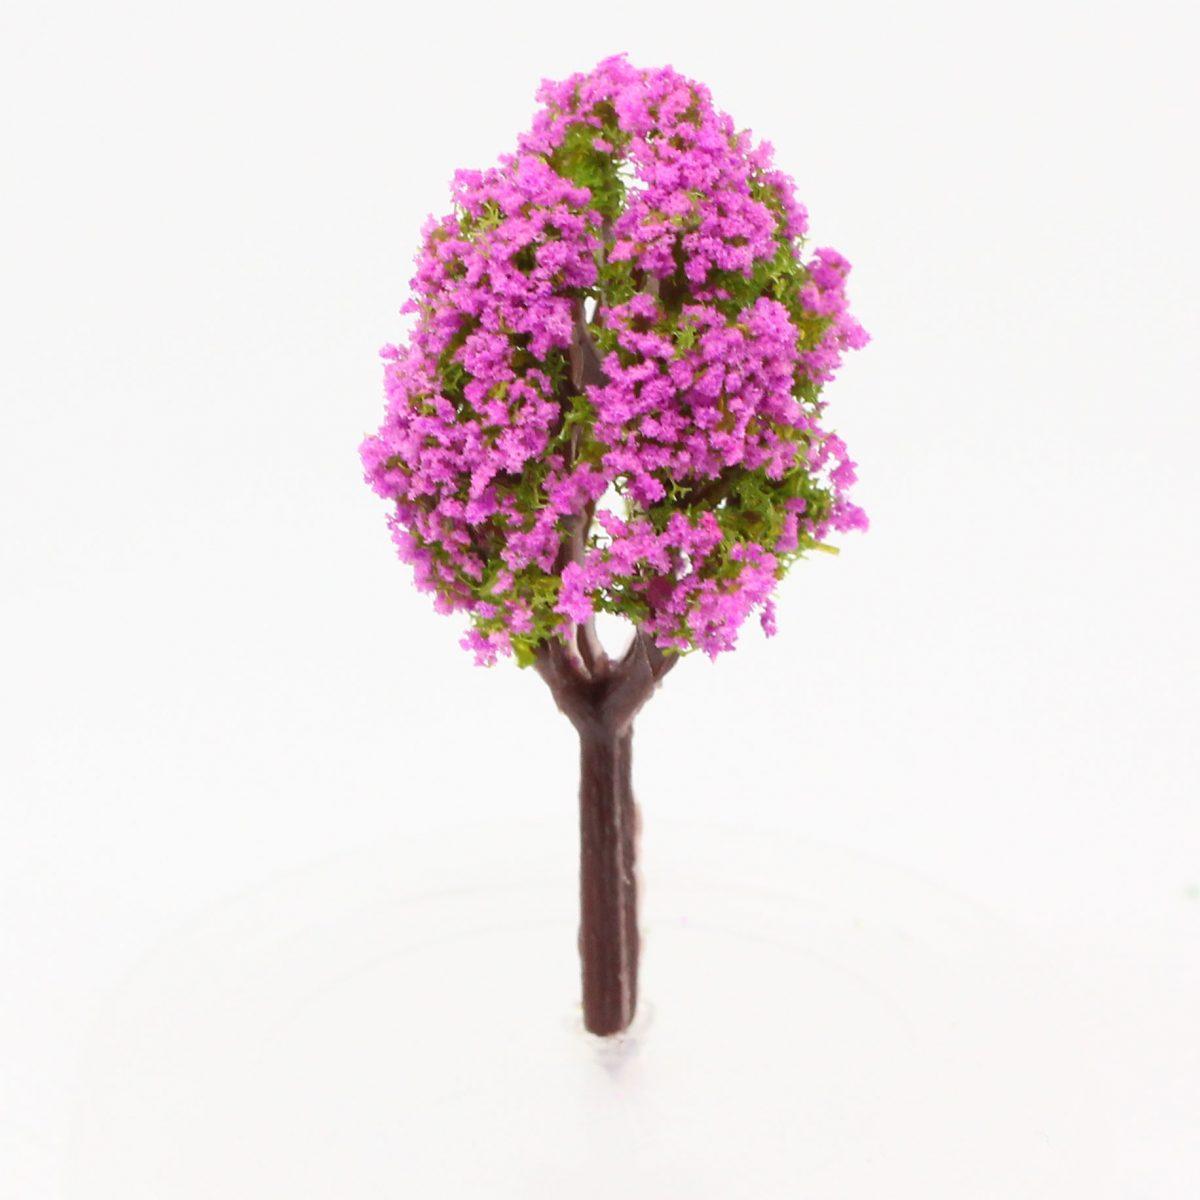 Model tree (mauve/lilac flowering) - 4cm Image 1